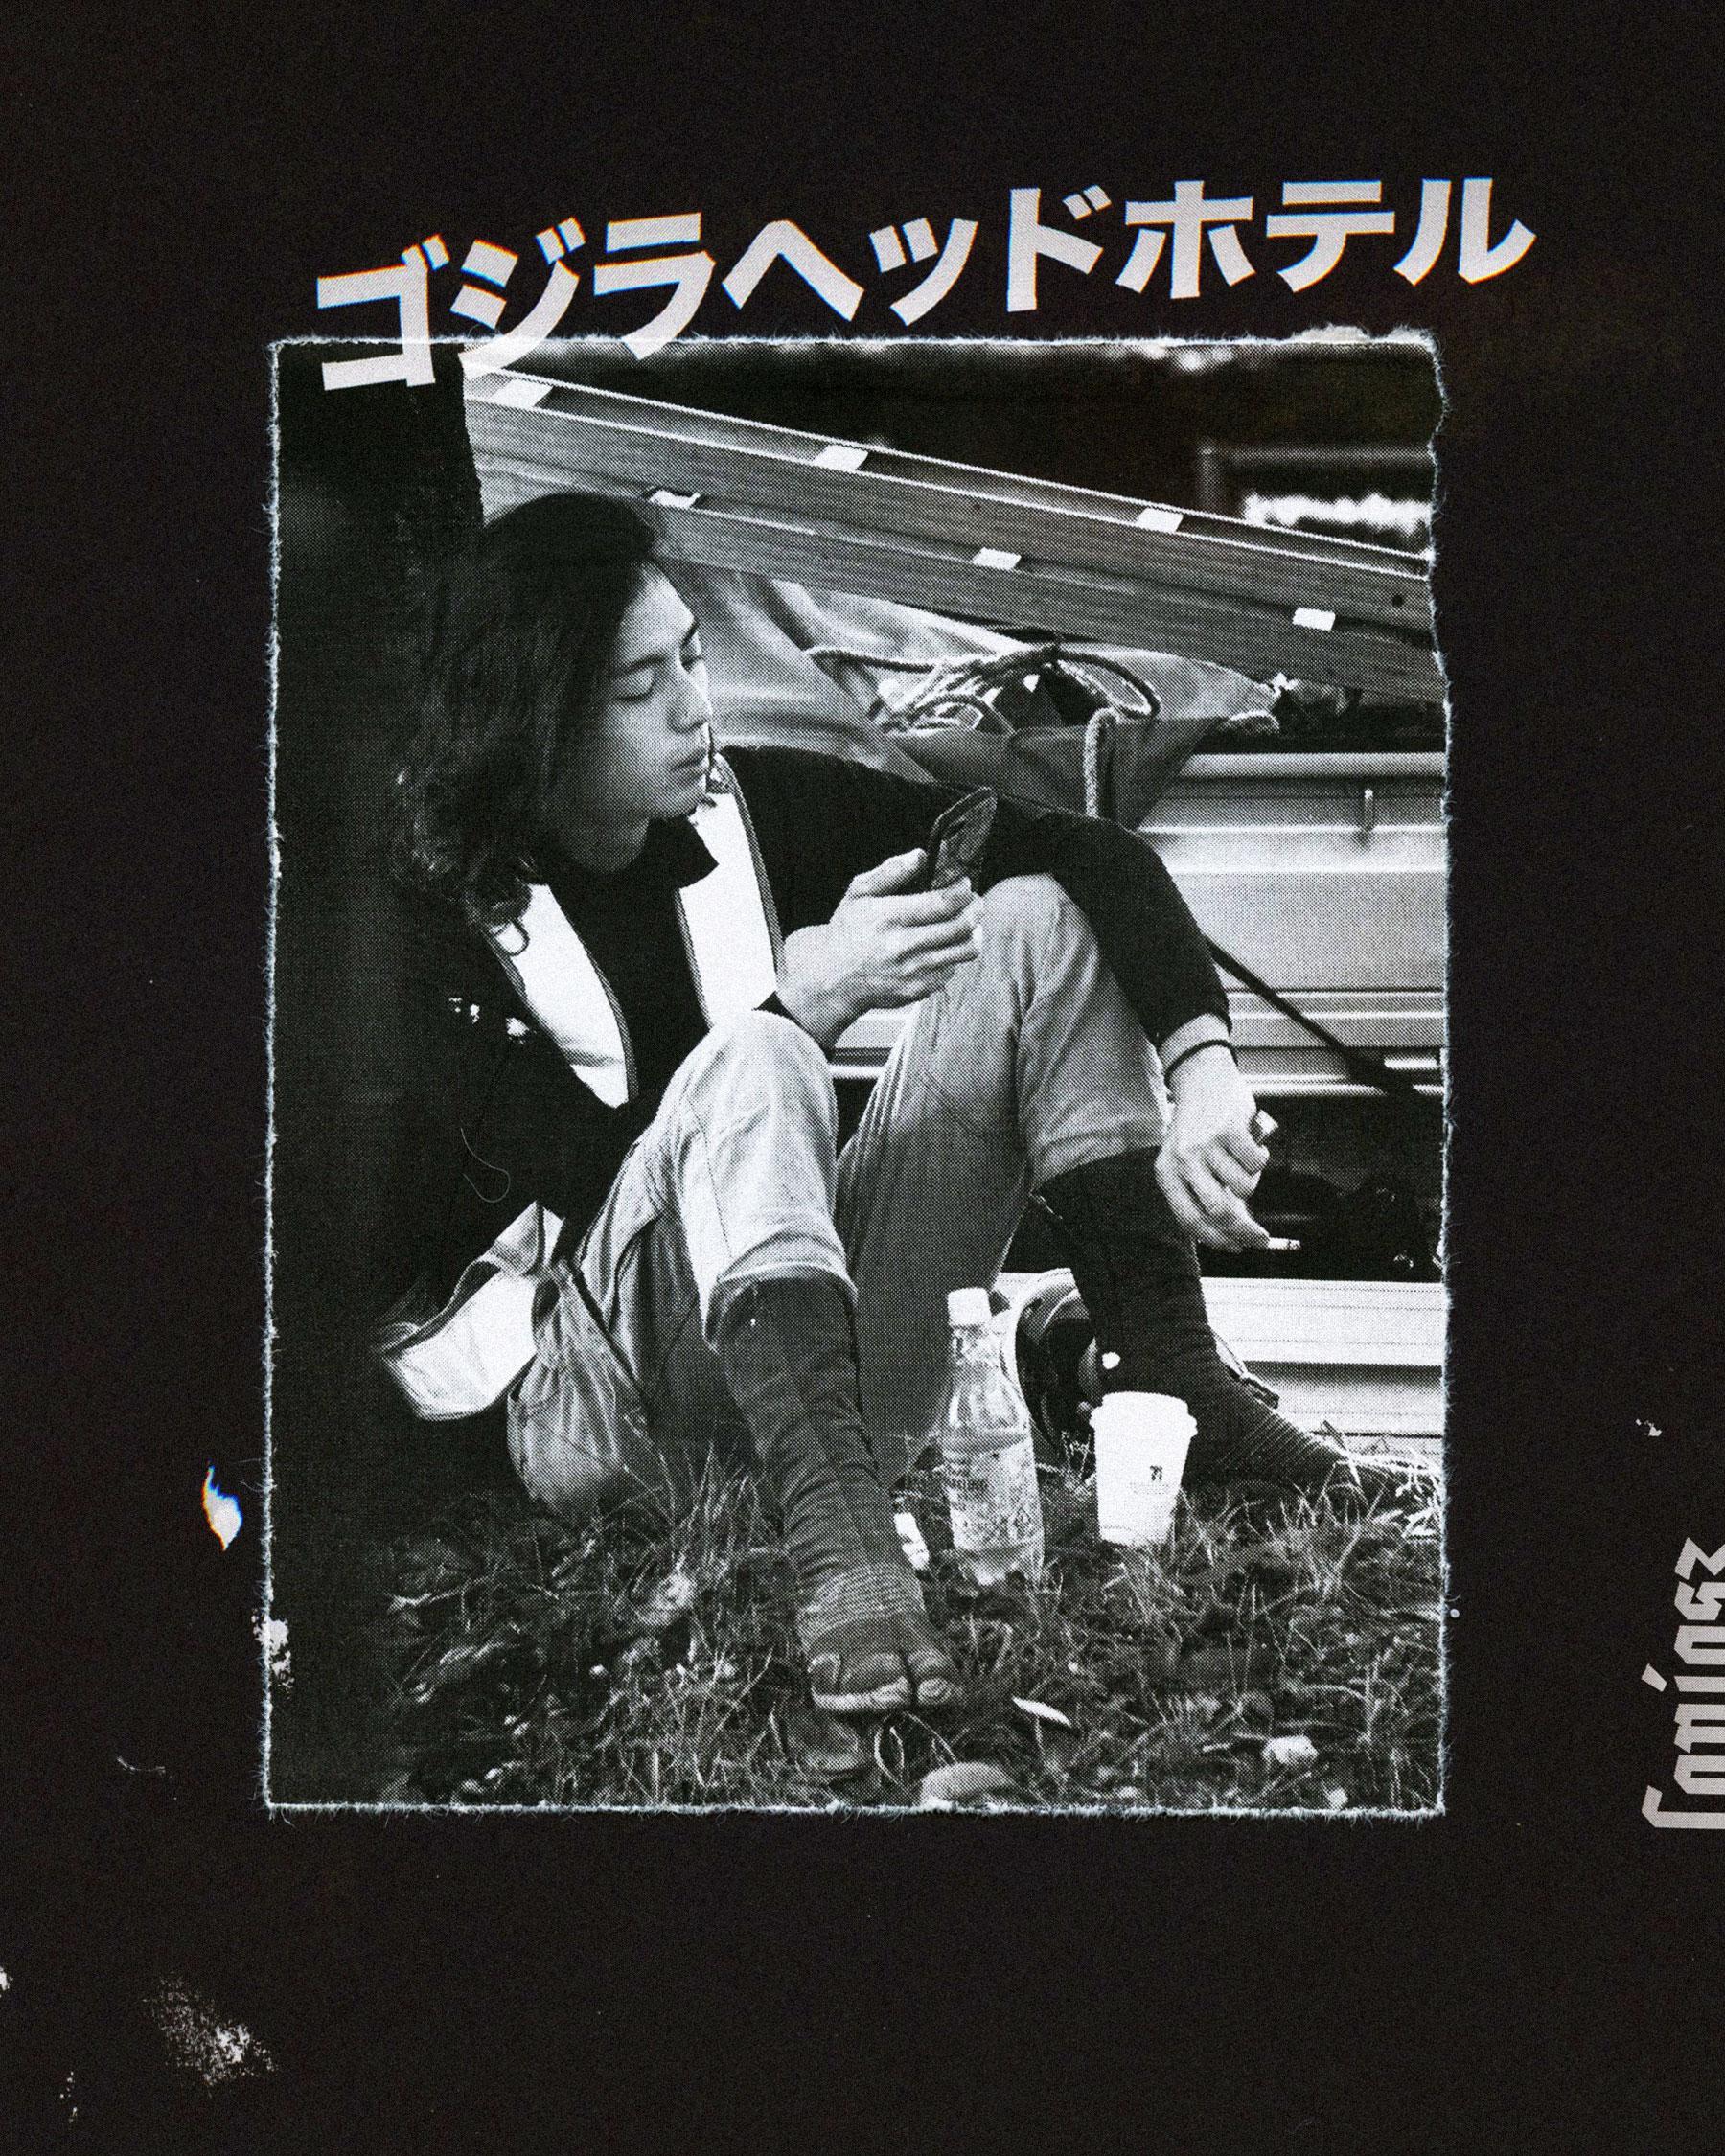 alex-laniosz-japan-ghh-collage-1.jpg